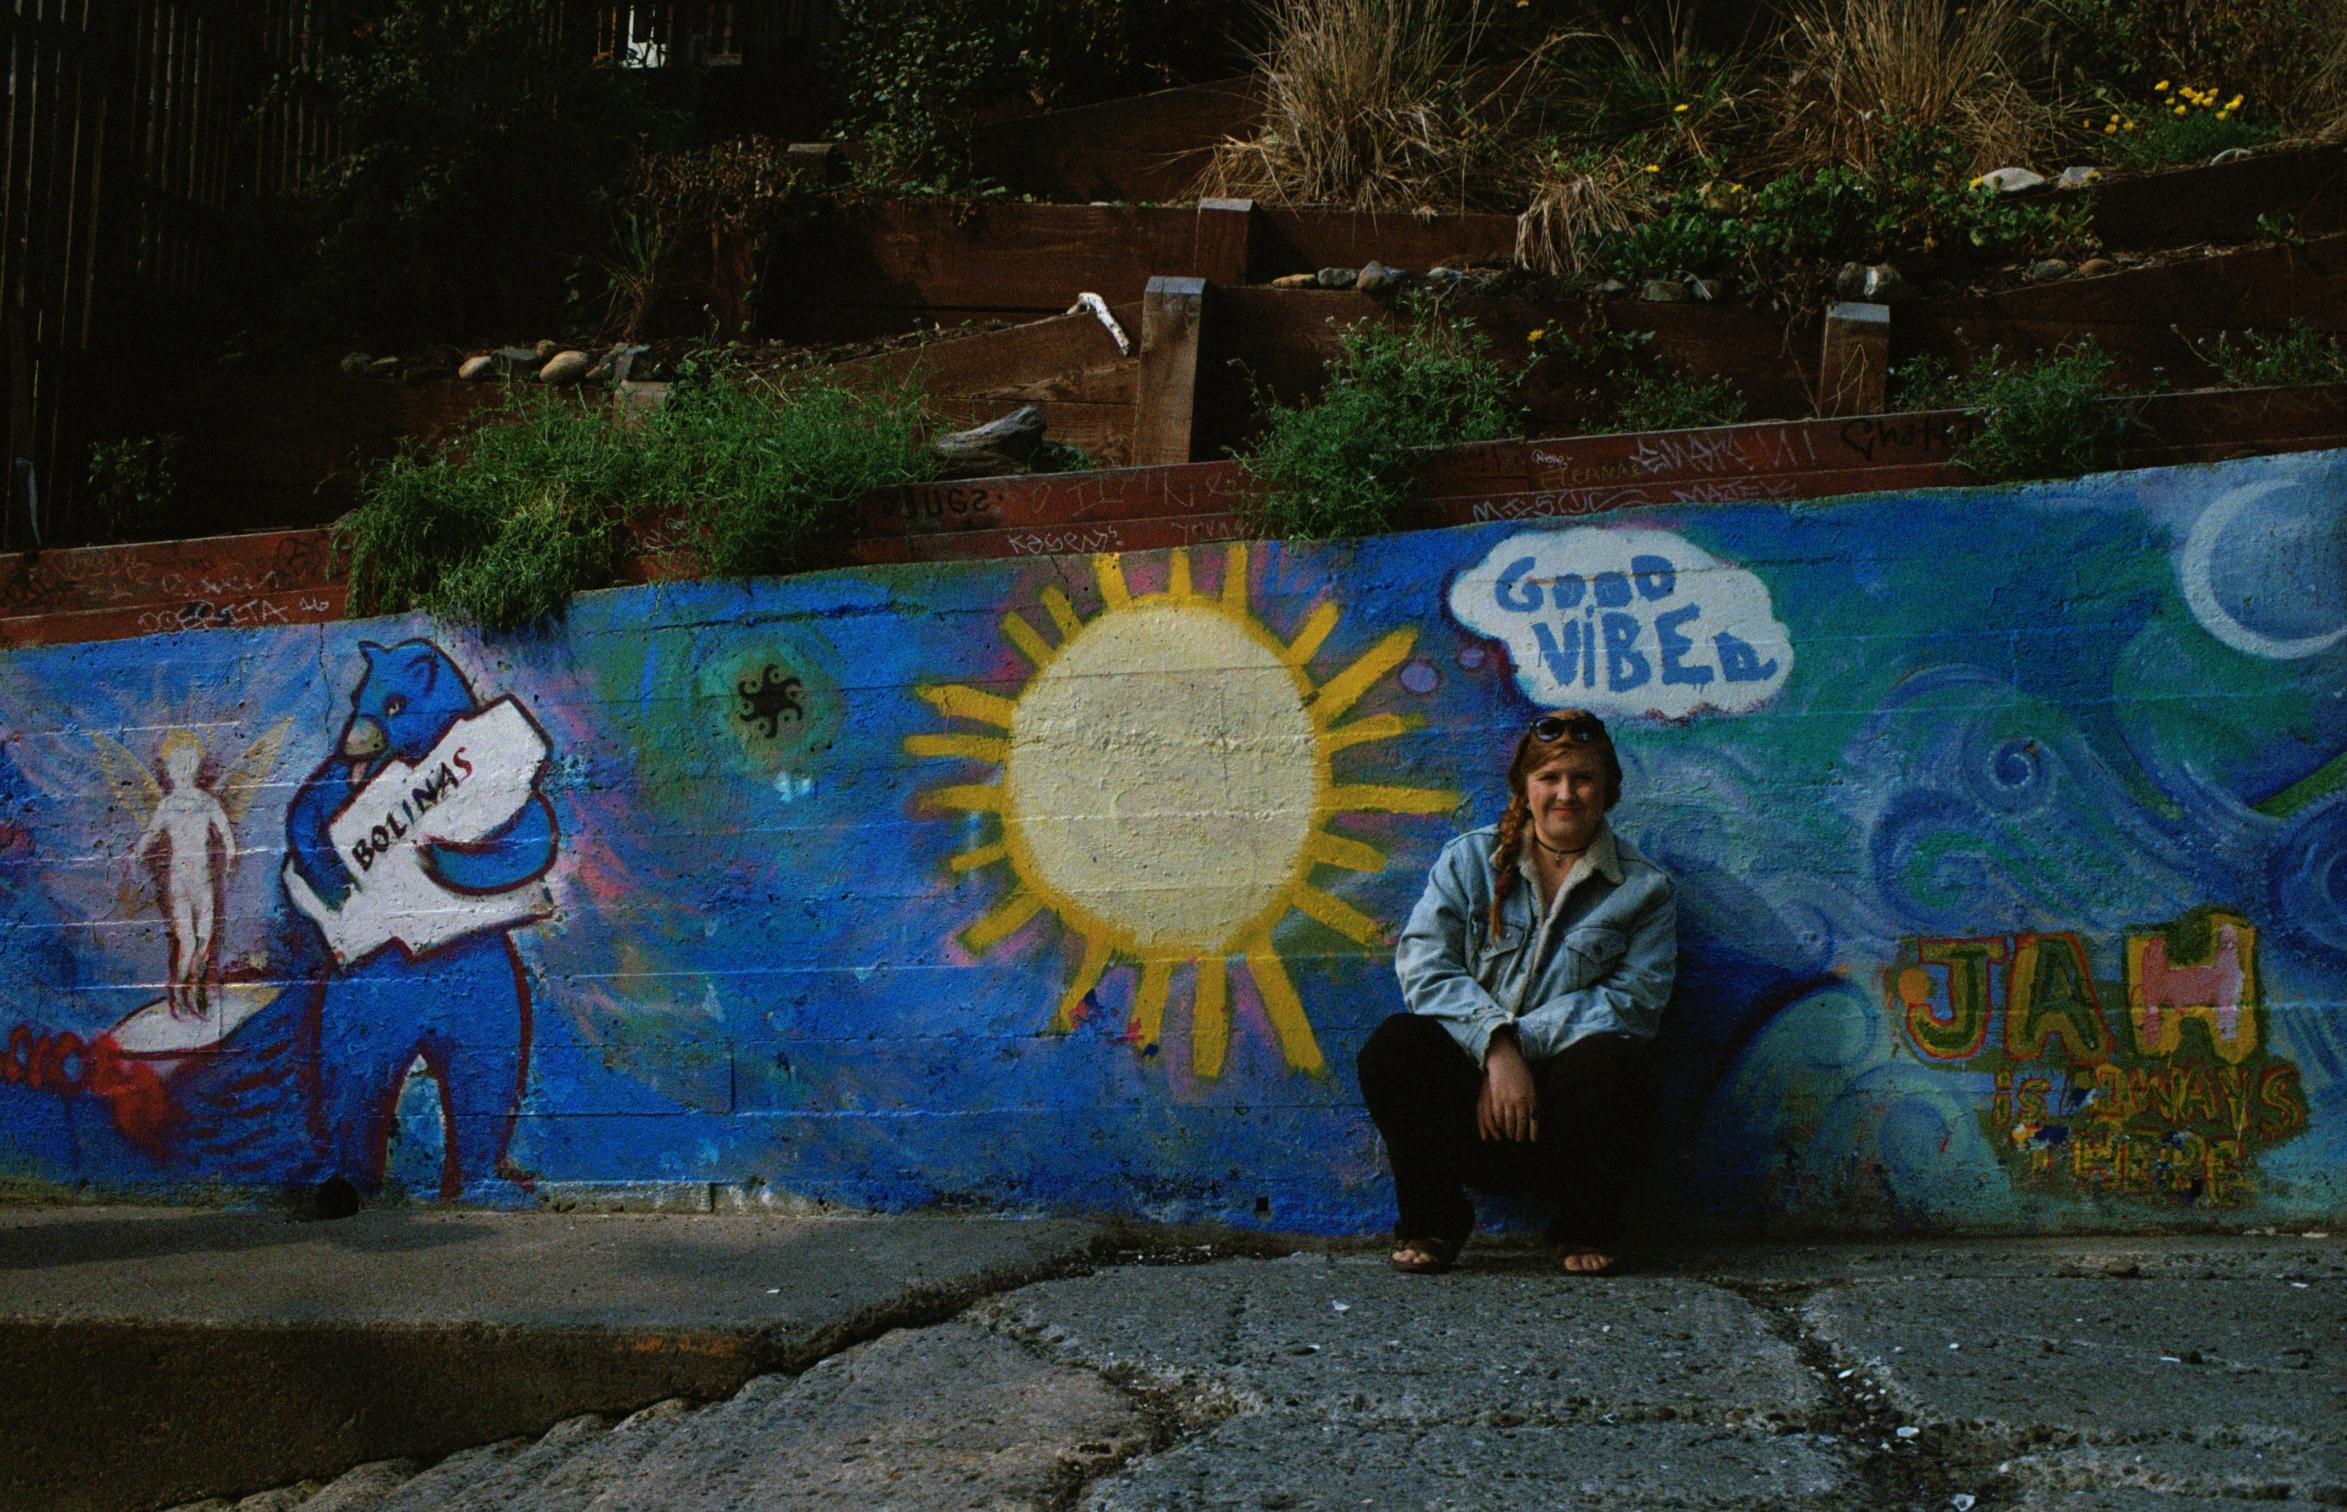 Good Vibes in Bolinas, California